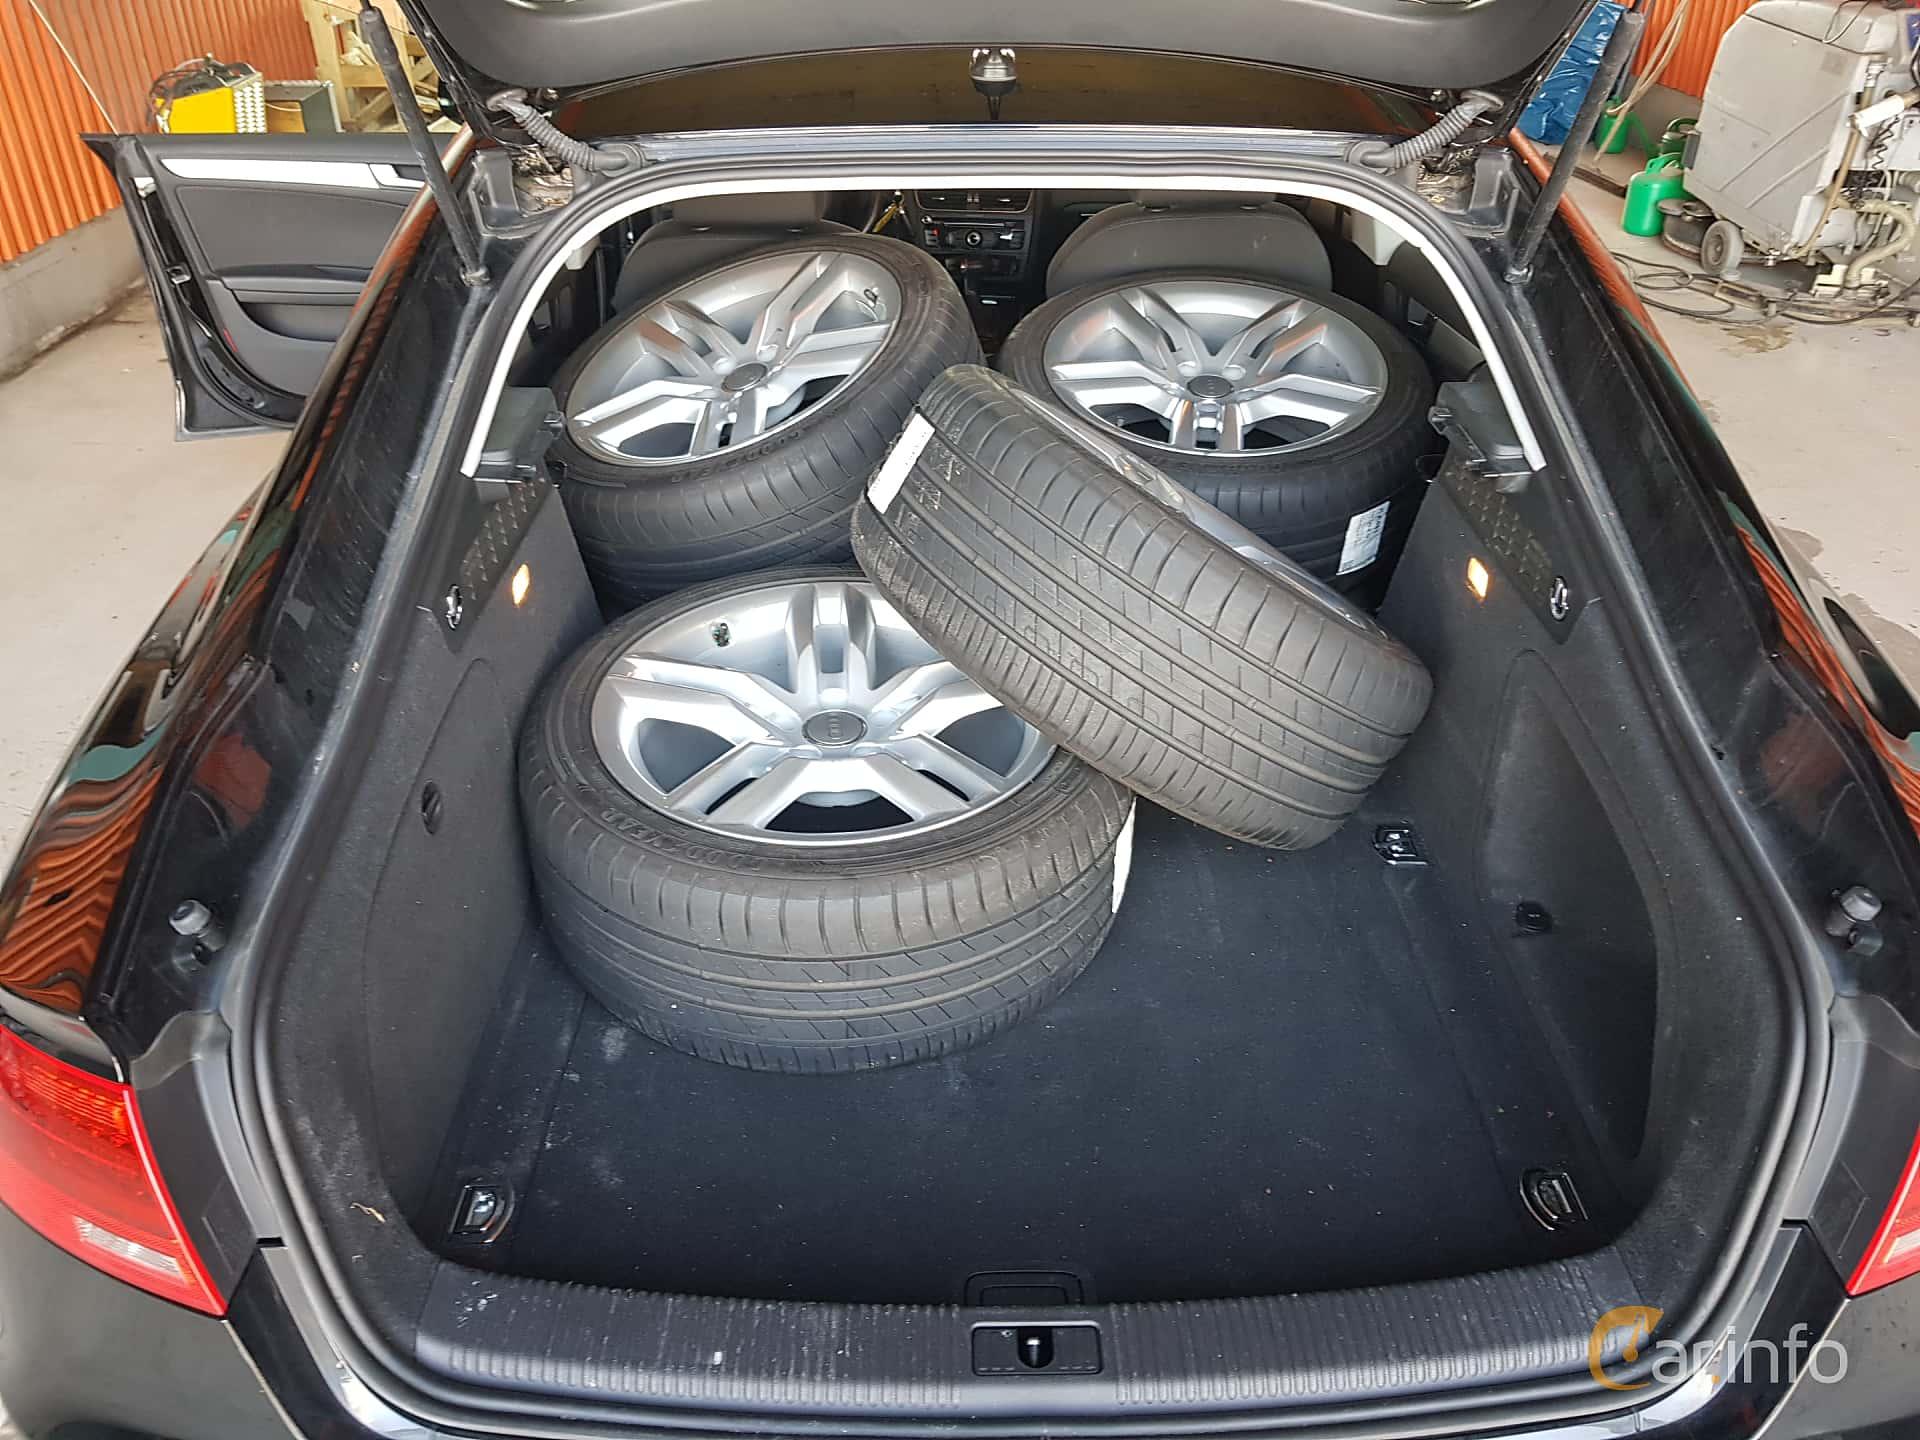 Audi A5 Sportback 2.0 TDI clean diesel quattro  S Tronic, 190hp, 2016